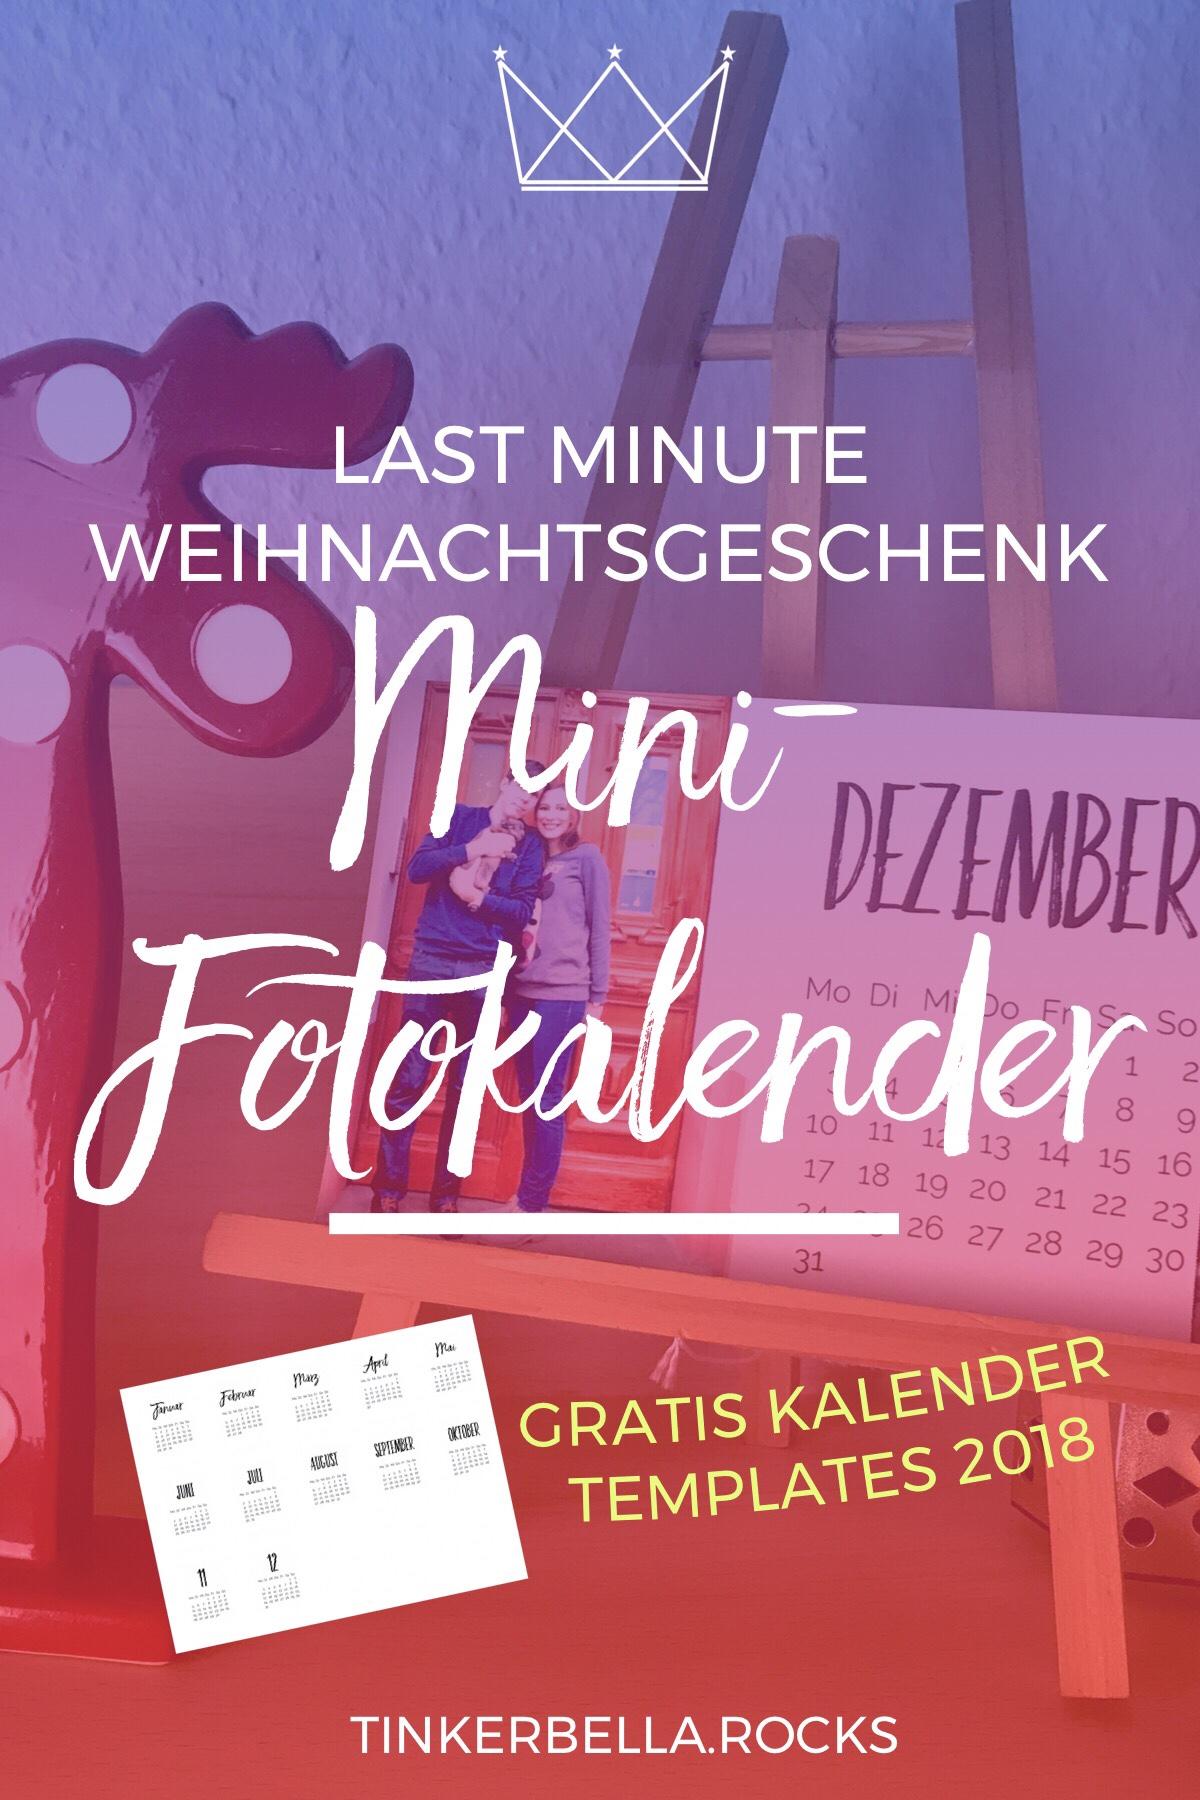 Last Minute Weihnachtsgeschenk: Mini-Fotokalender inkl. Kalender ...